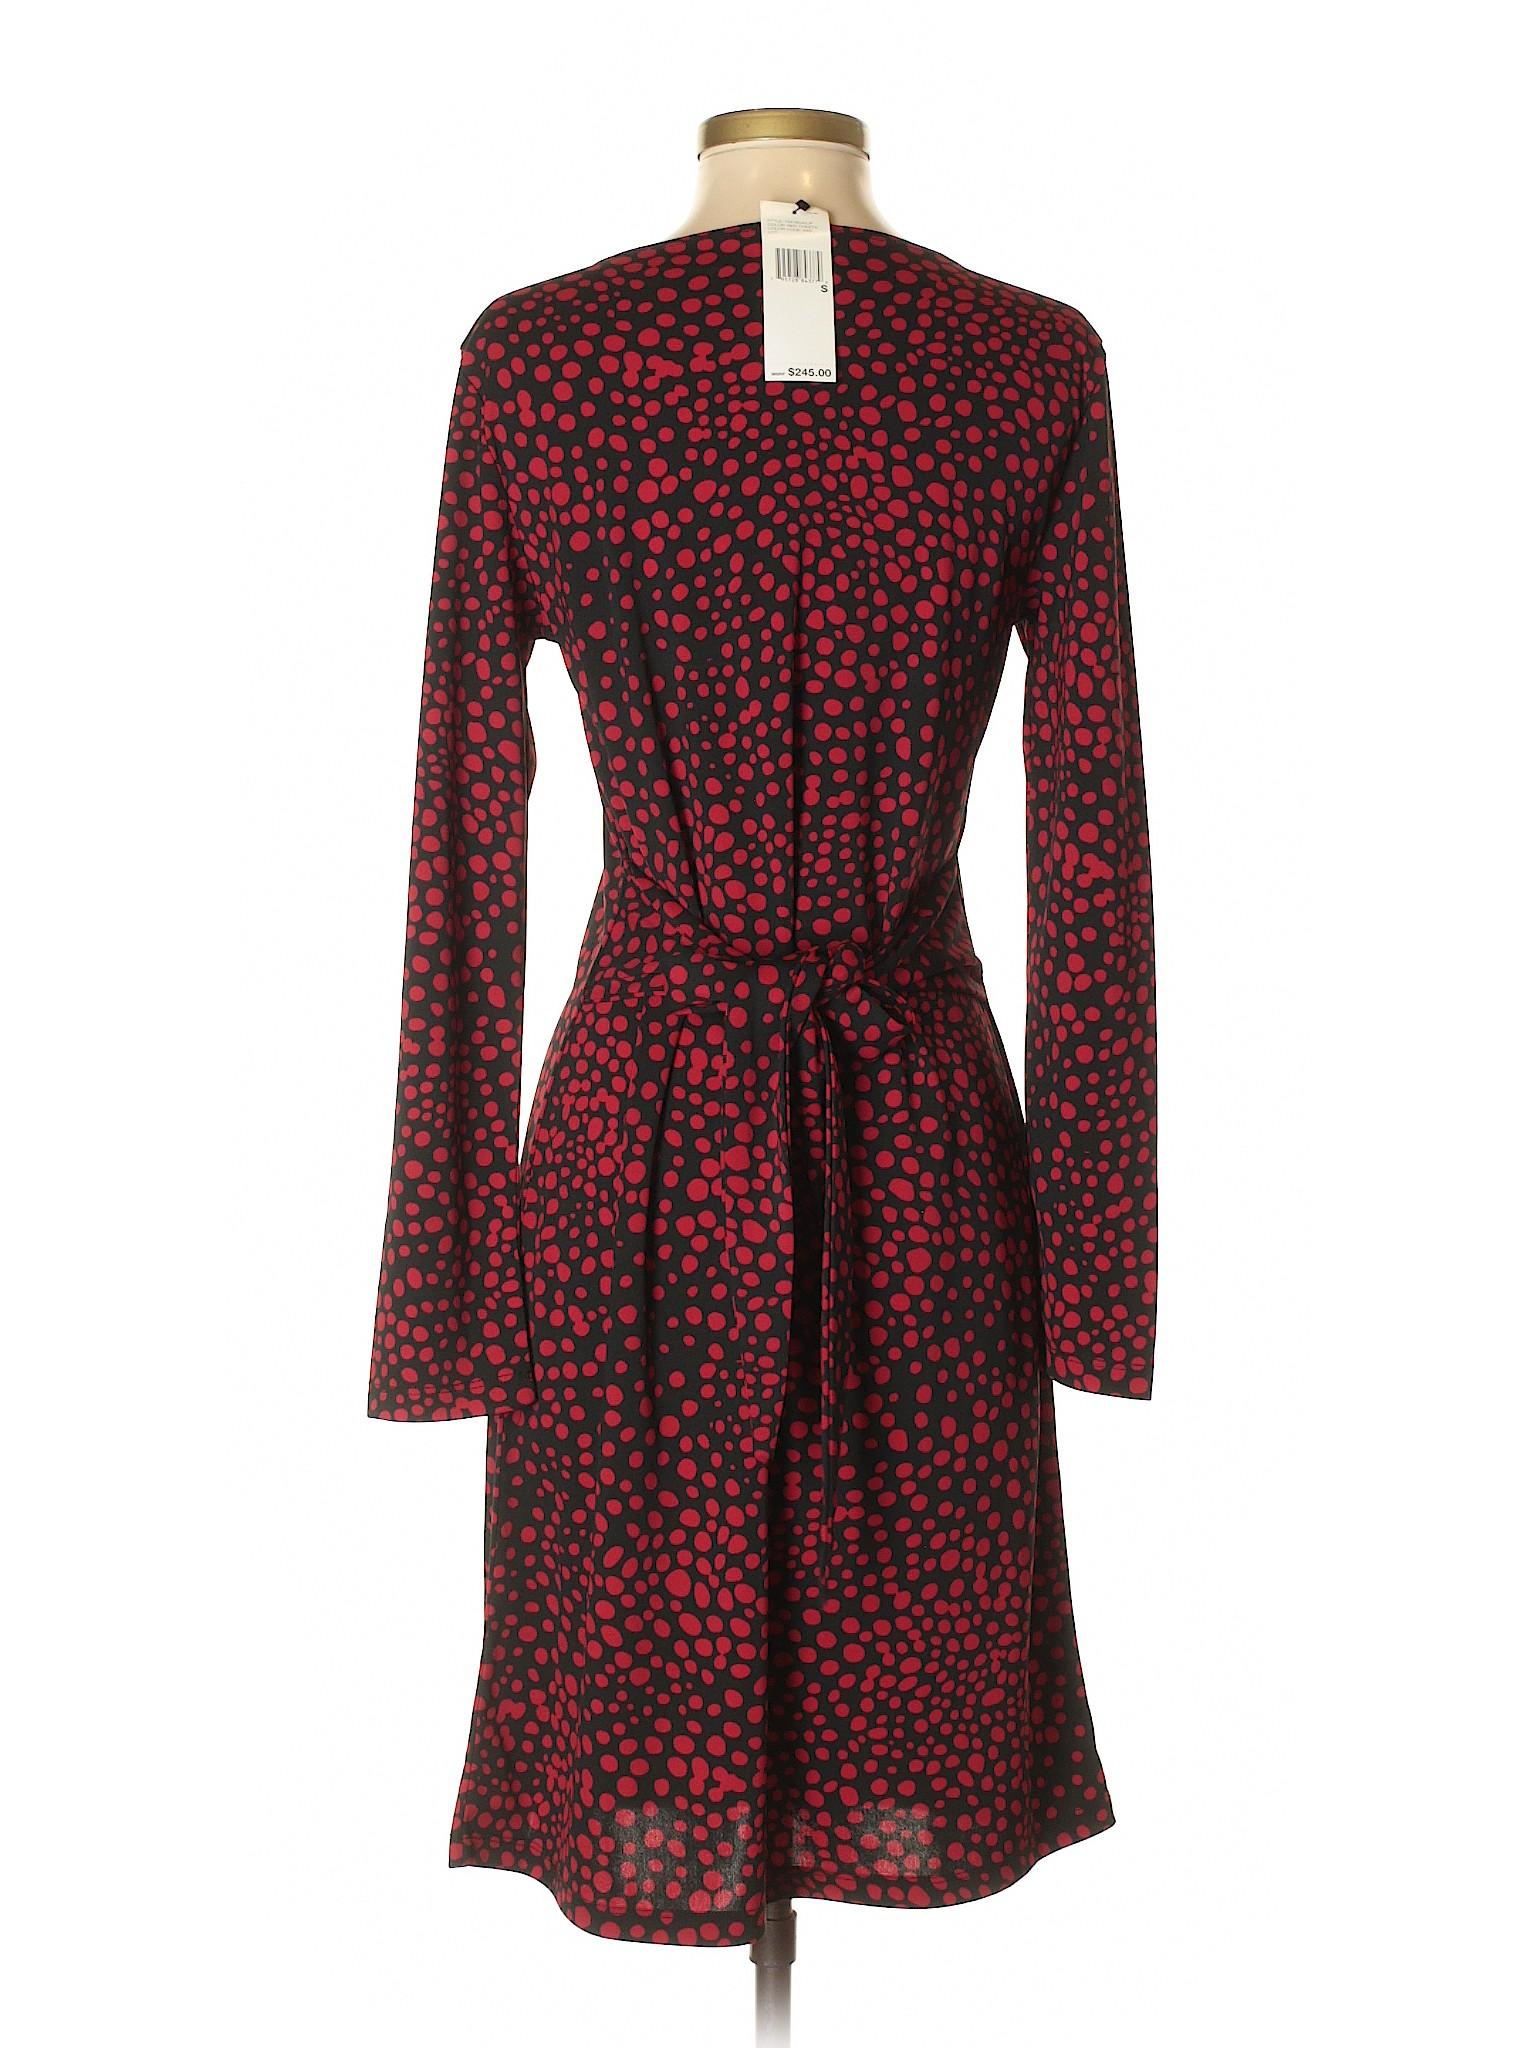 Boutique Dress Casual Casual Boutique winter Boutique DKNY winter DKNY Dress winter DKNY 5w6qRAUP